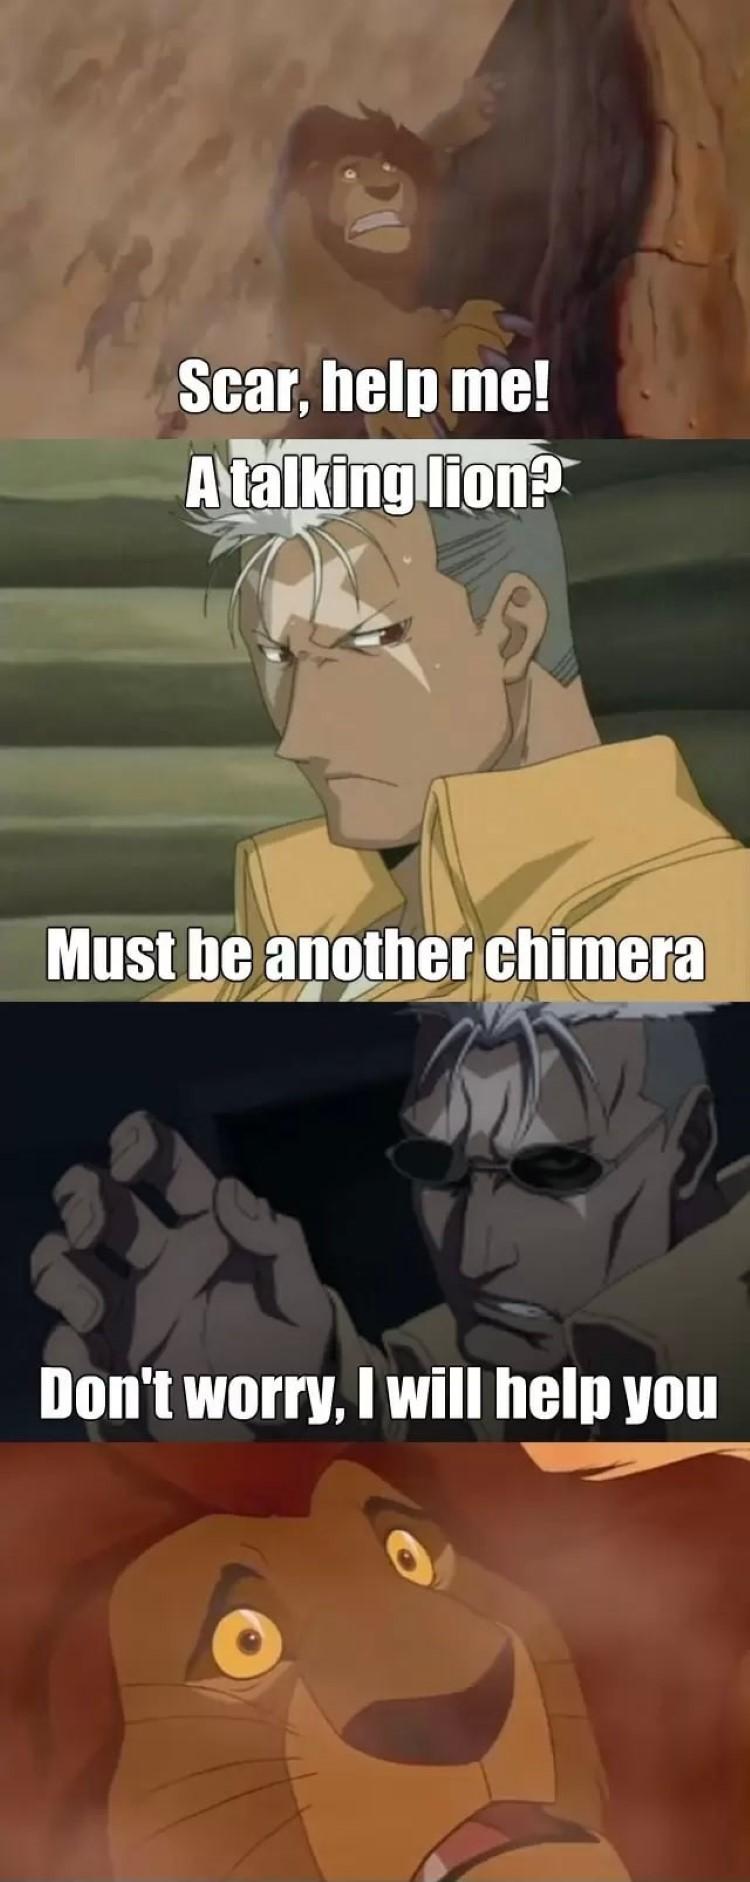 Scar help me! meme